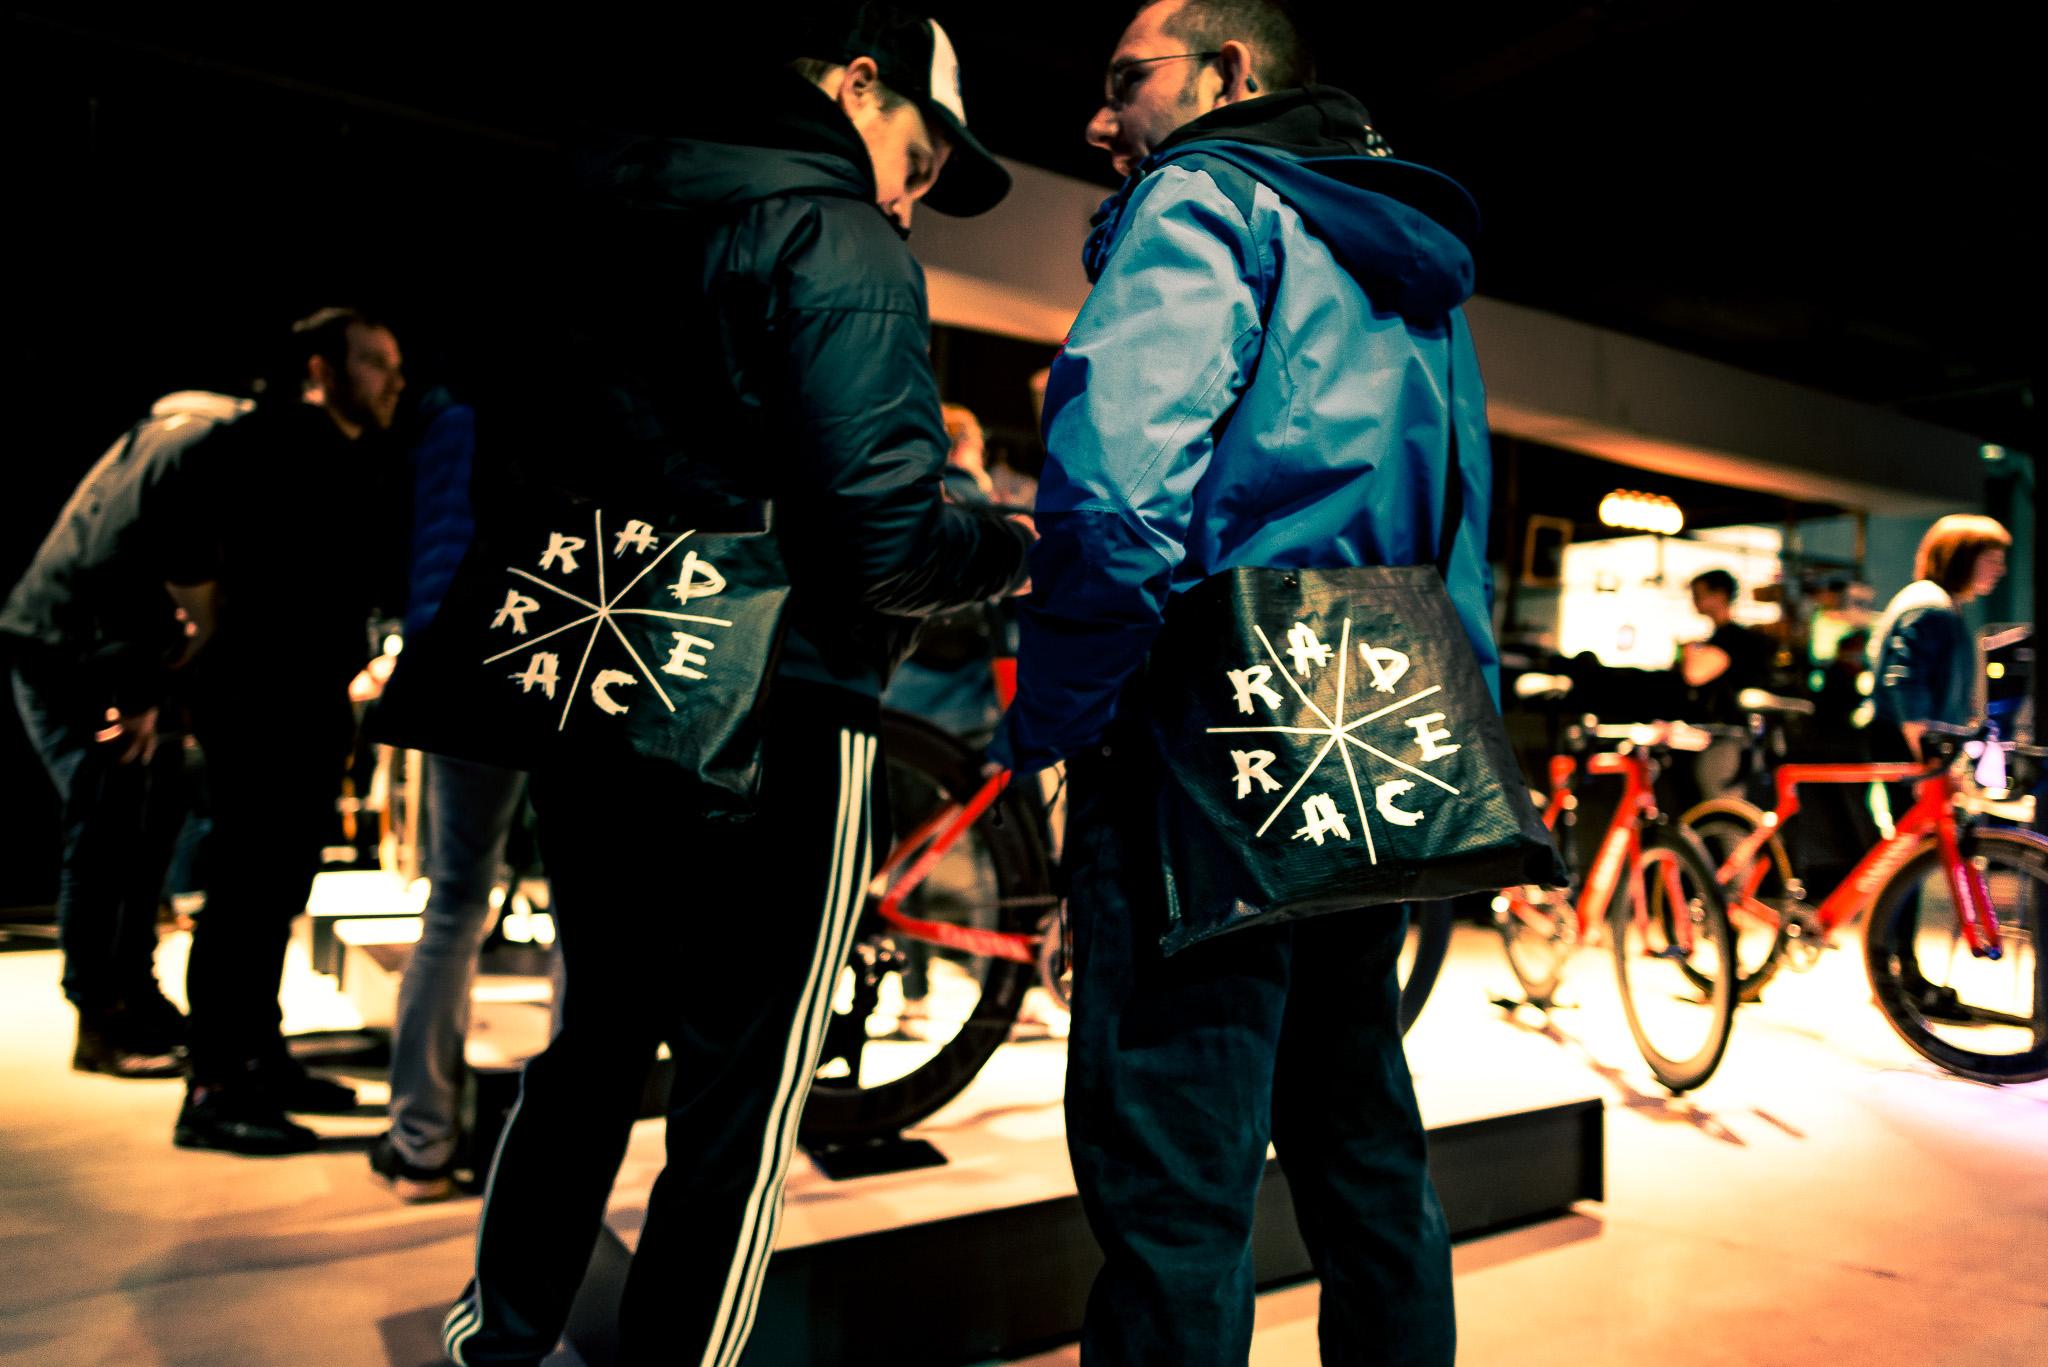 Kolektif_BikeFair_Berlin_MSalens_DSC_3273.jpg